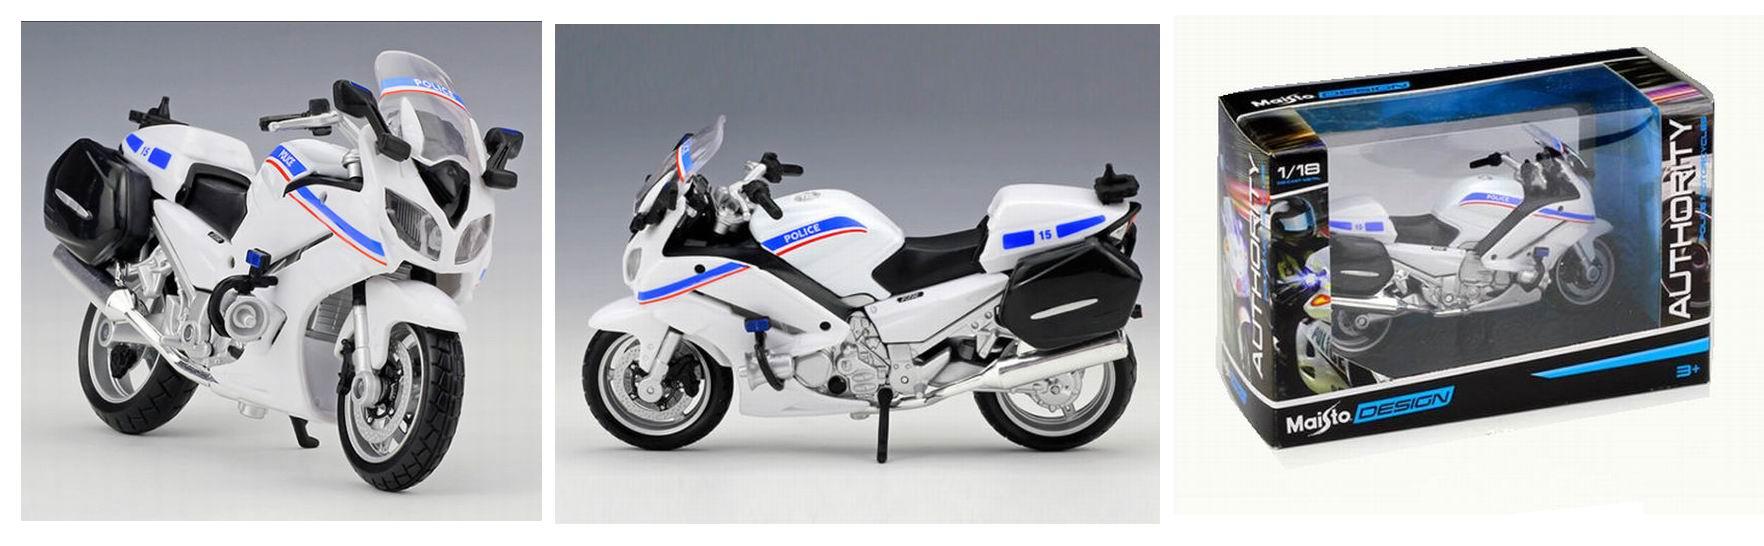 Moto escort POLICE NATIONALE Française Yamaha FJR 1300A 1/18